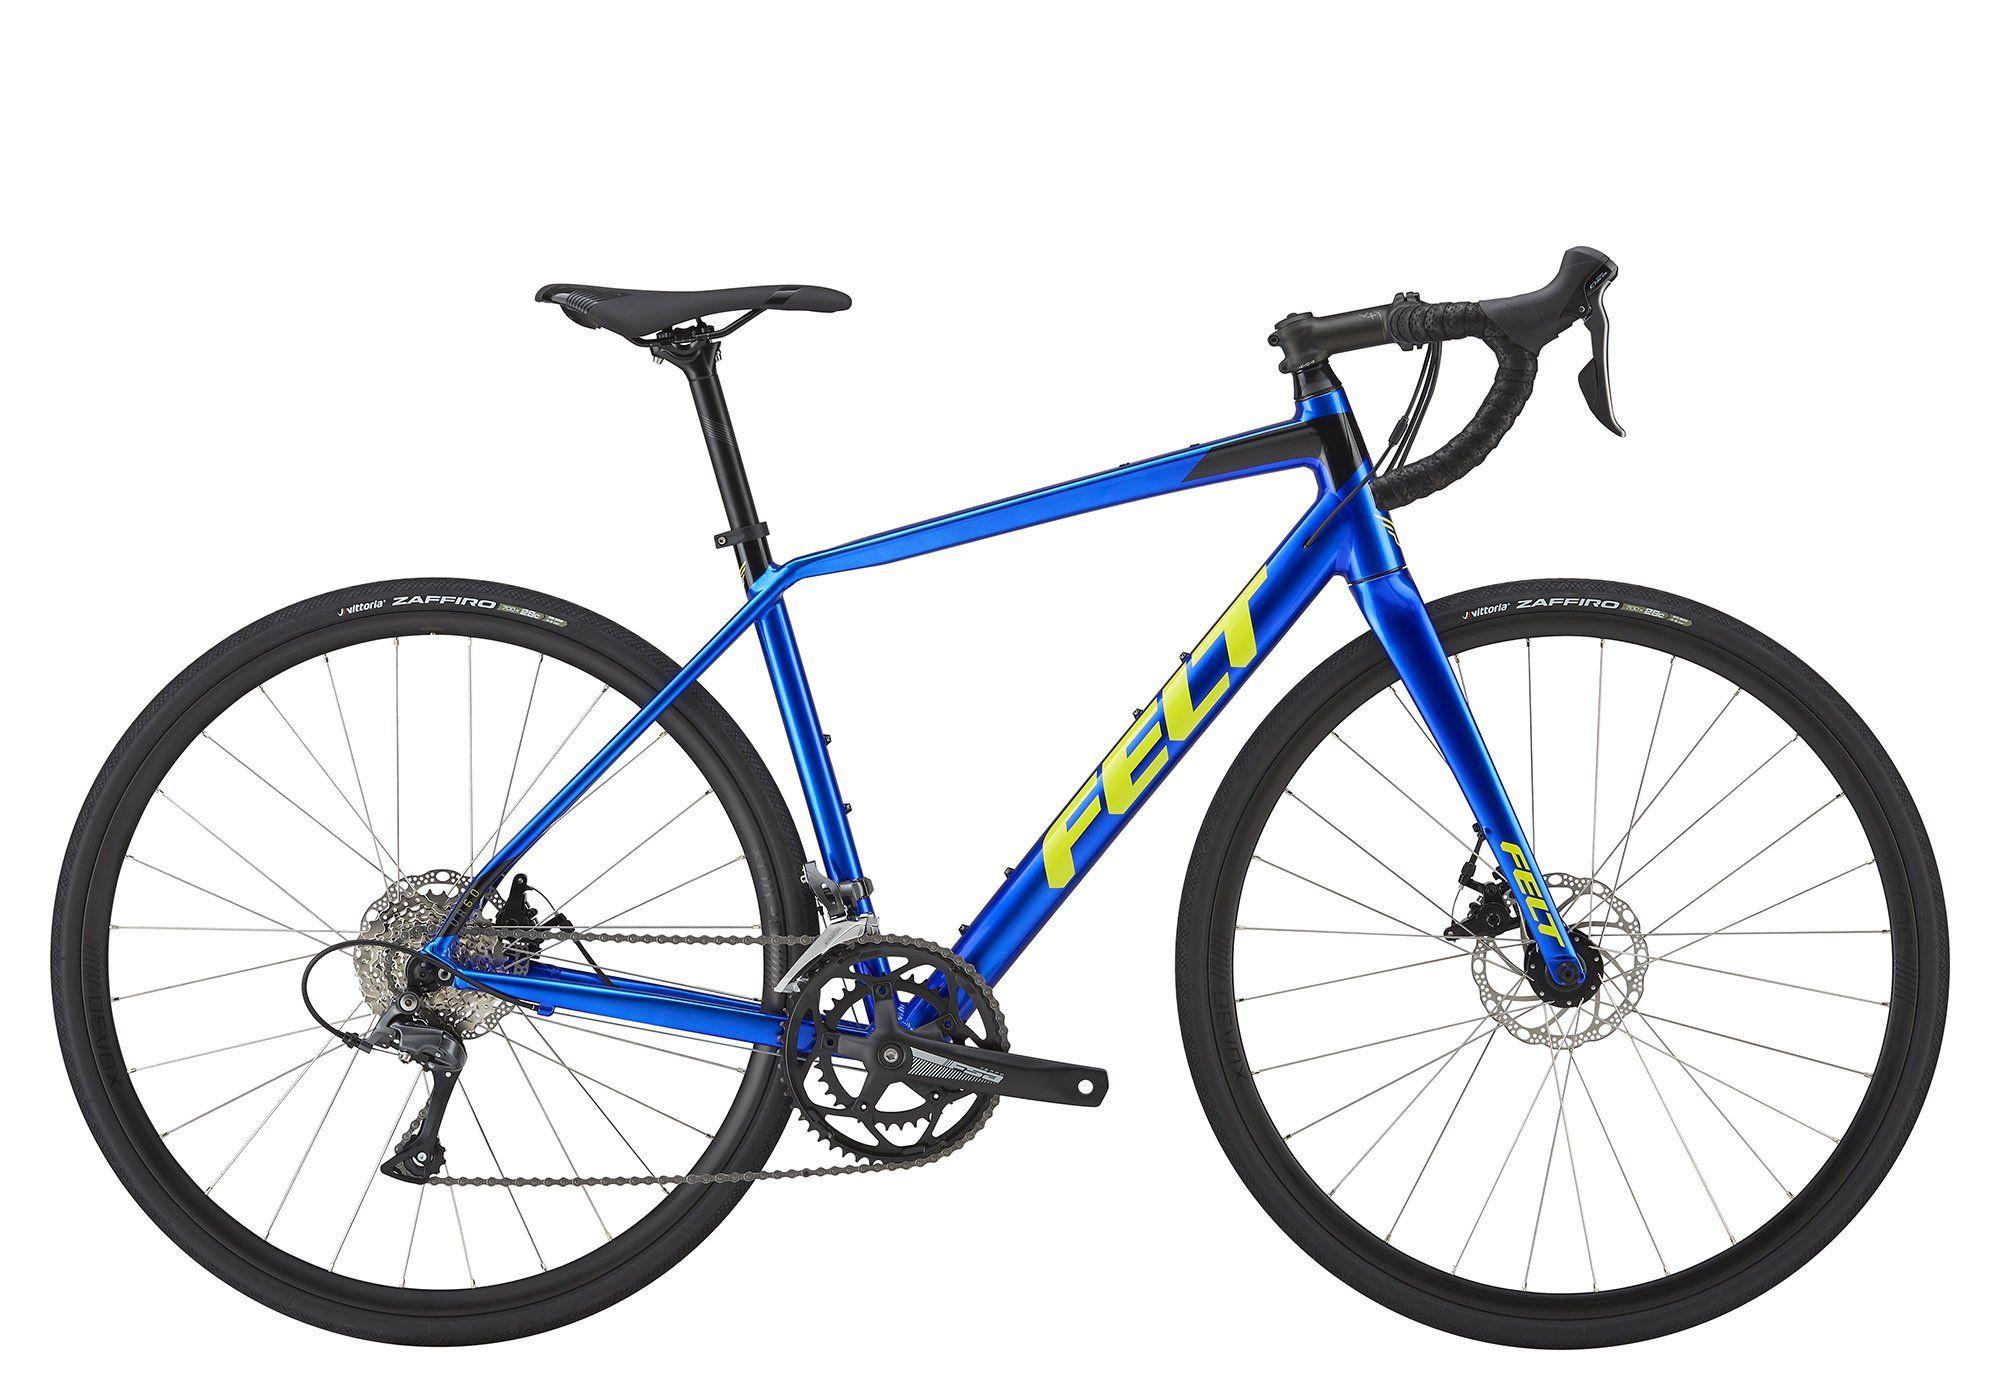 Vr60 2019 Bicycle Bike Bicycle Maintenance